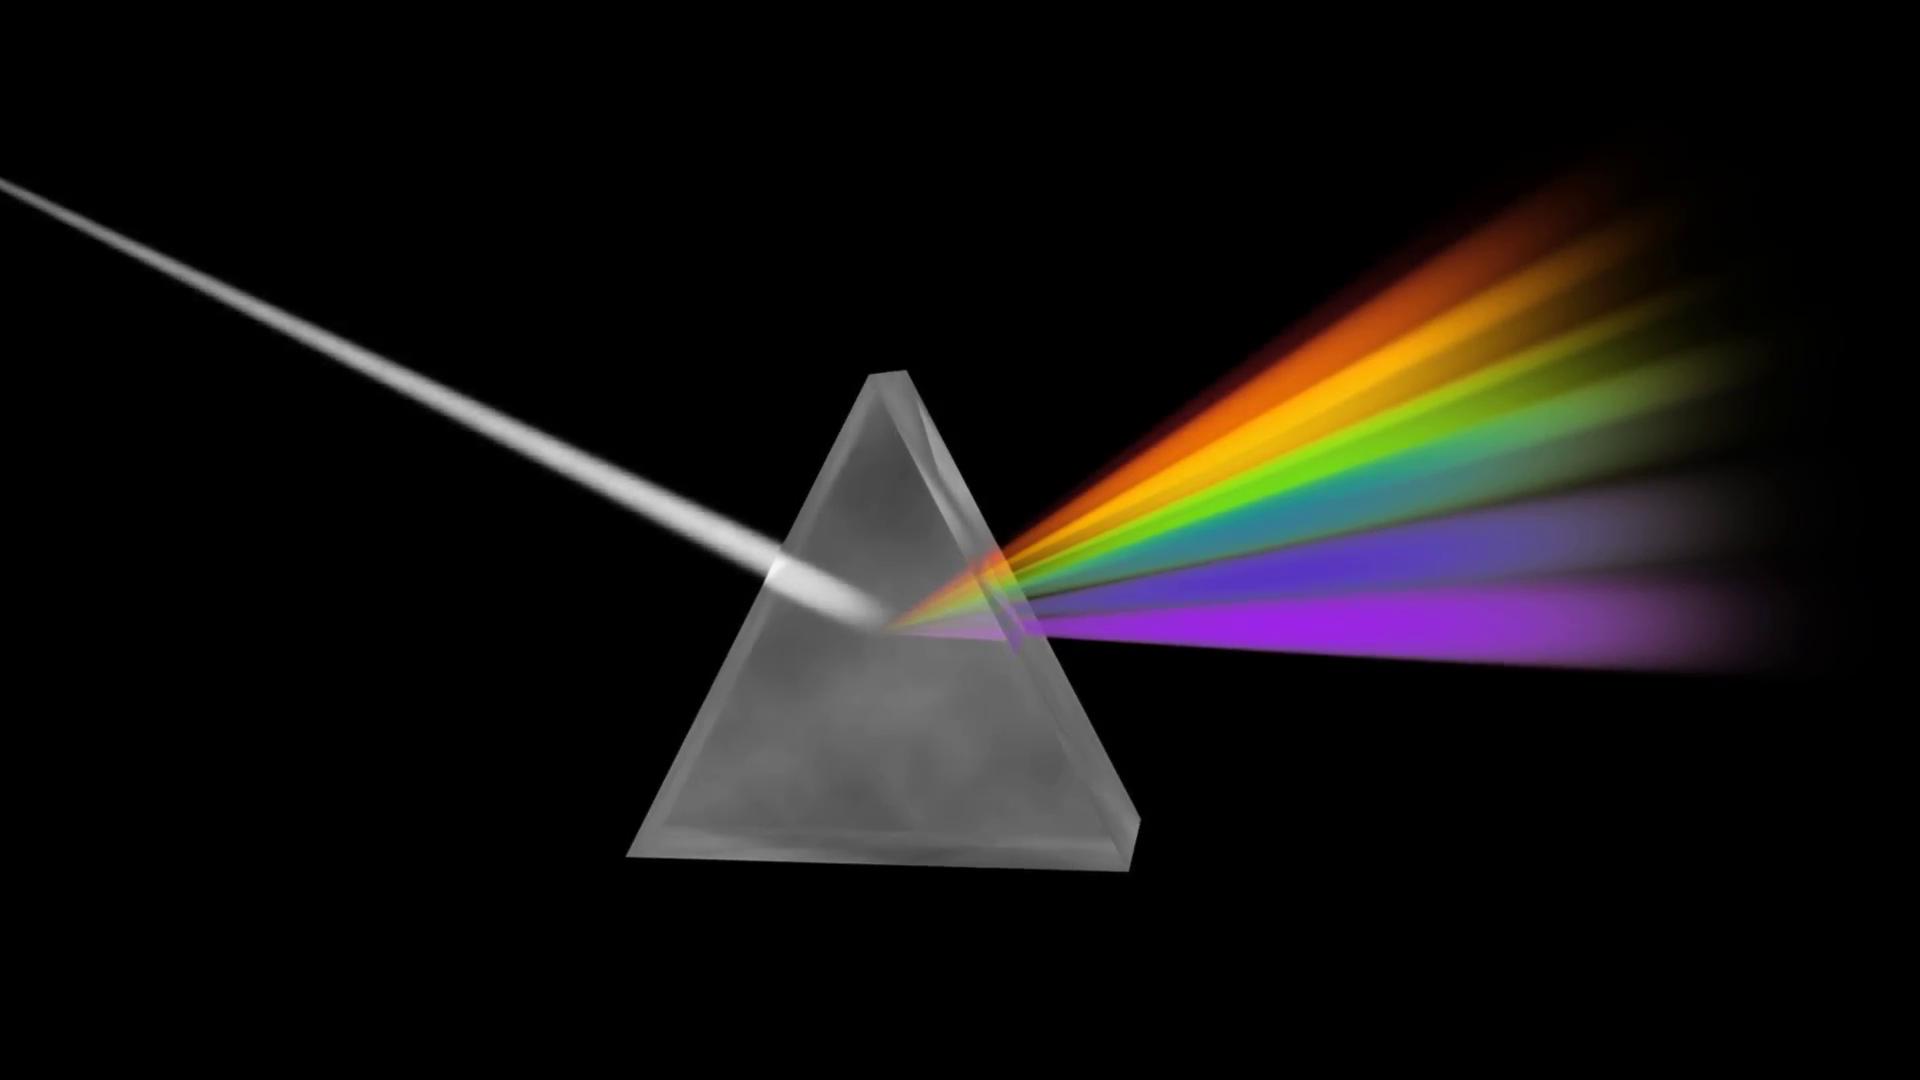 Prism Separating Light Spectrum Motion Background.